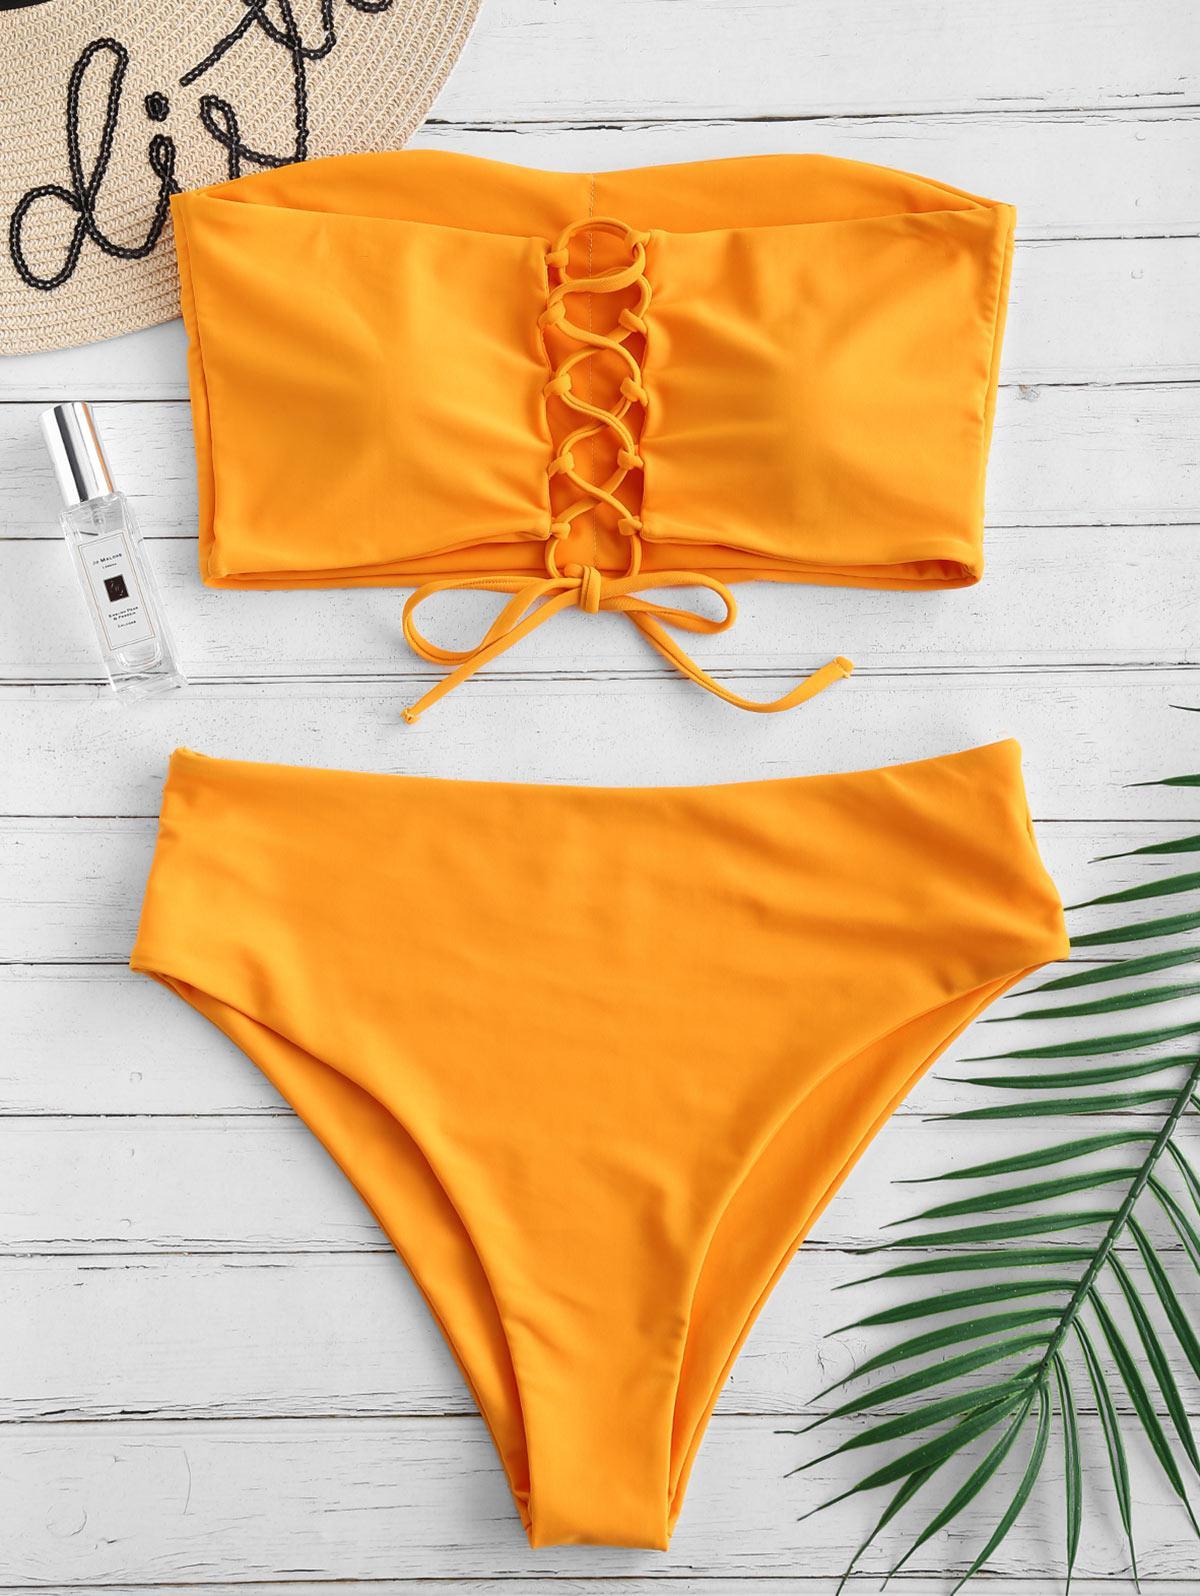 ZAFUL Lace-up High Rise Bandeau Bikini Set, Sandy brown